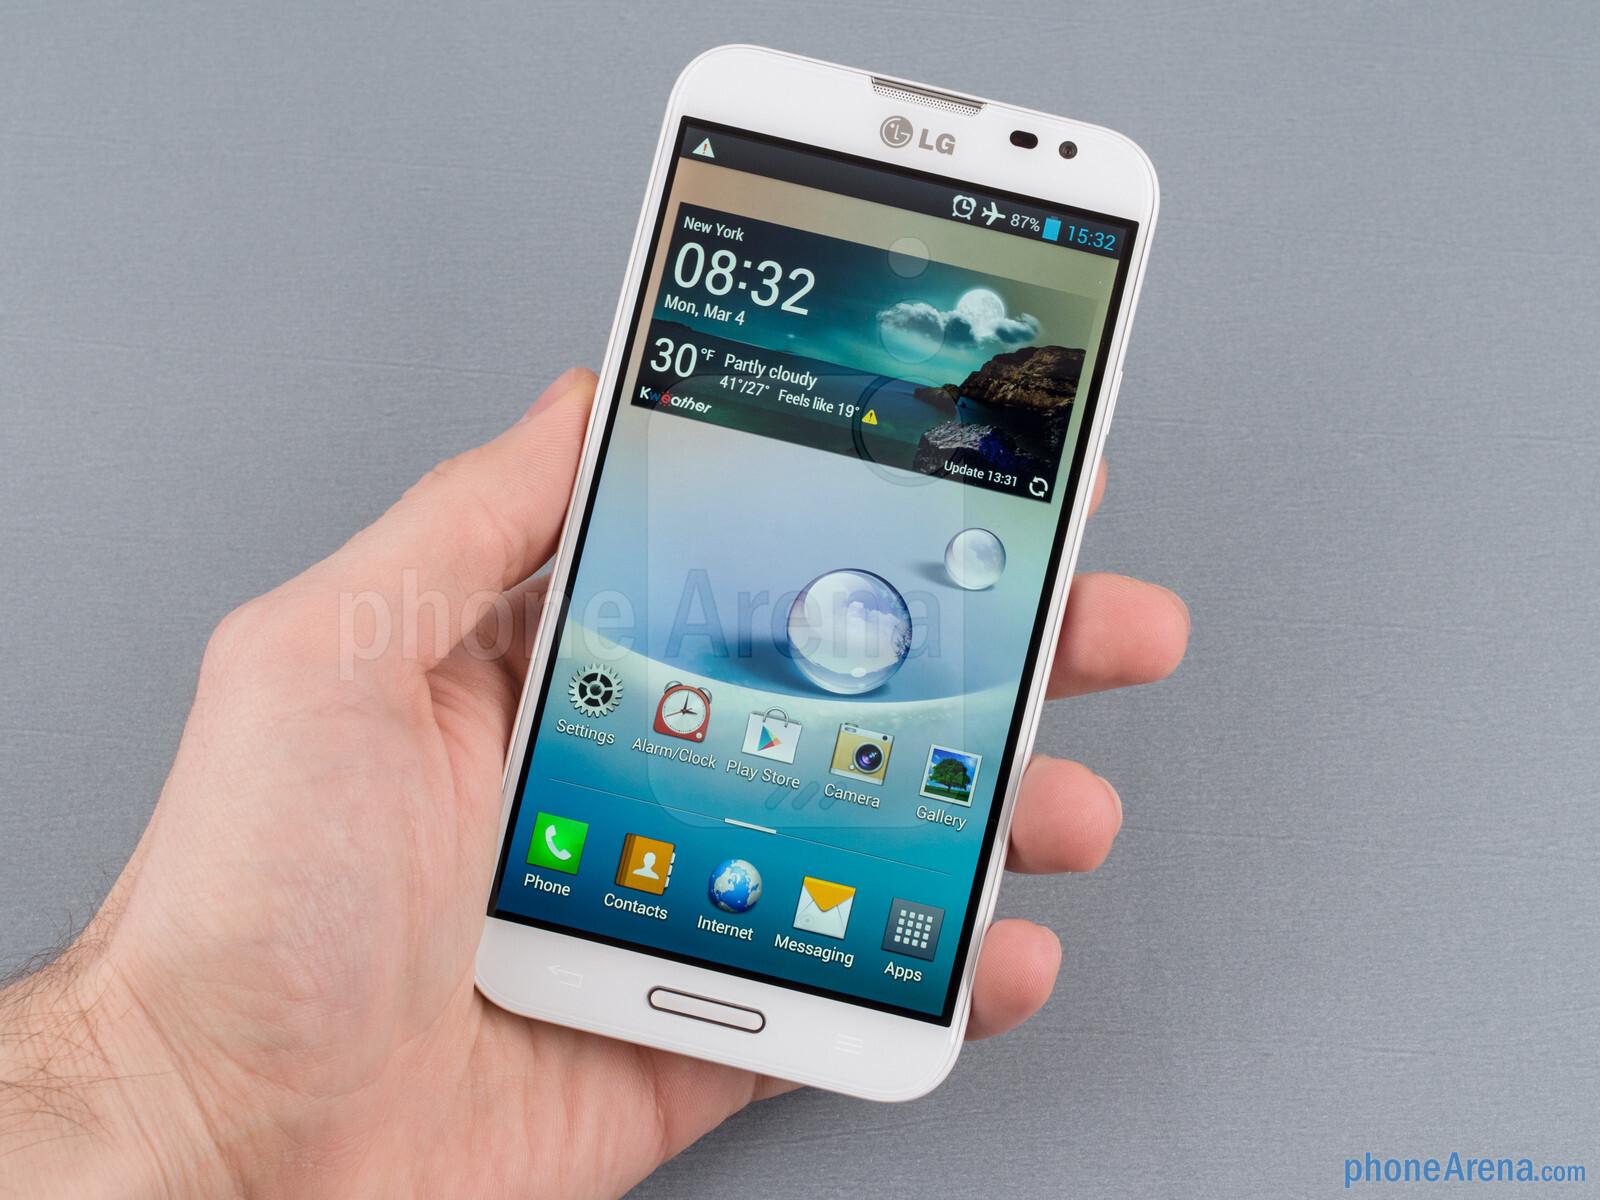 lg optimus g pro review rh phonearena com LG Optimus G Guide LG Optimus G Pro White